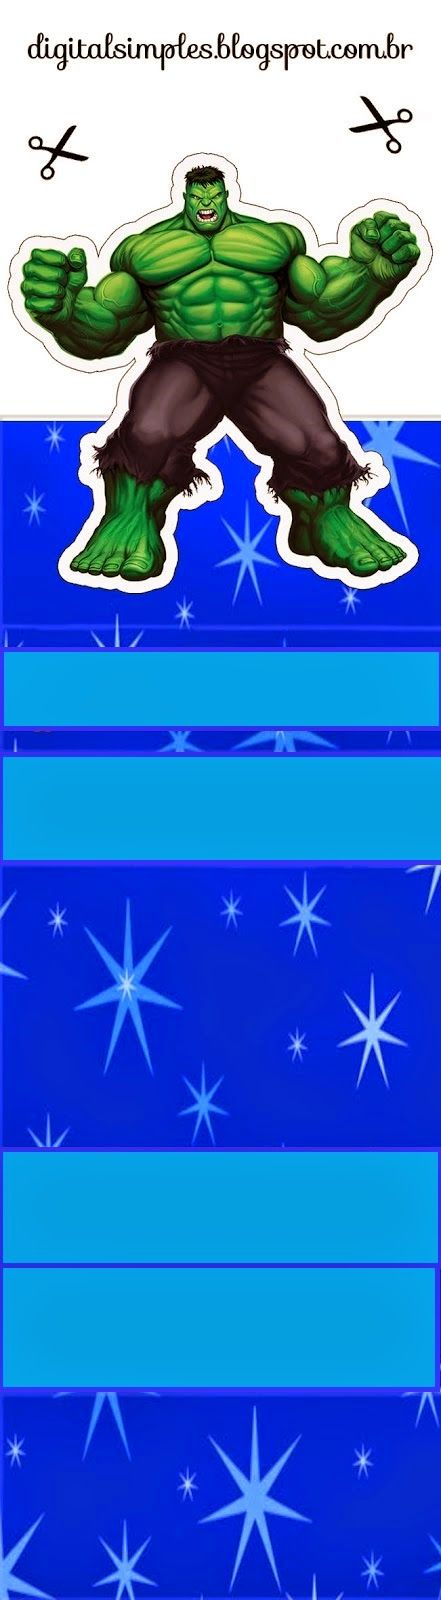 Los Vengadores: Envoltorios Gratis para Paquetes de Chicles o Golosinas.